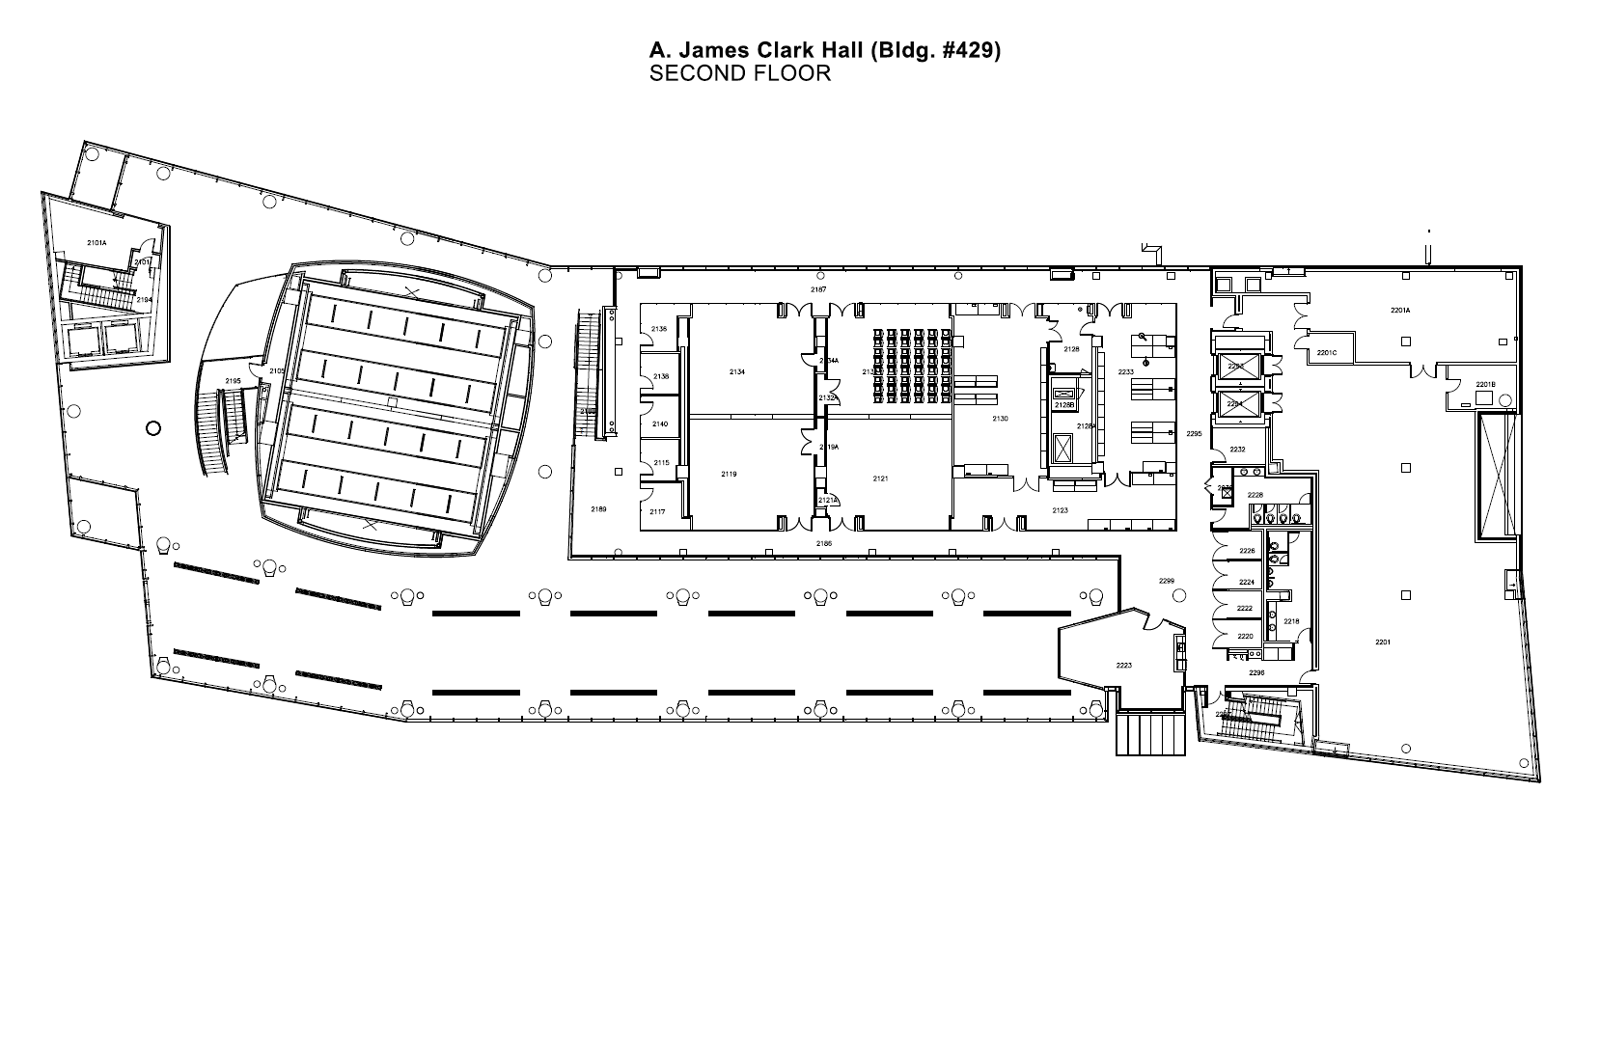 Arts Science Building University Of Wyoming Map | Wiring Diagram ...